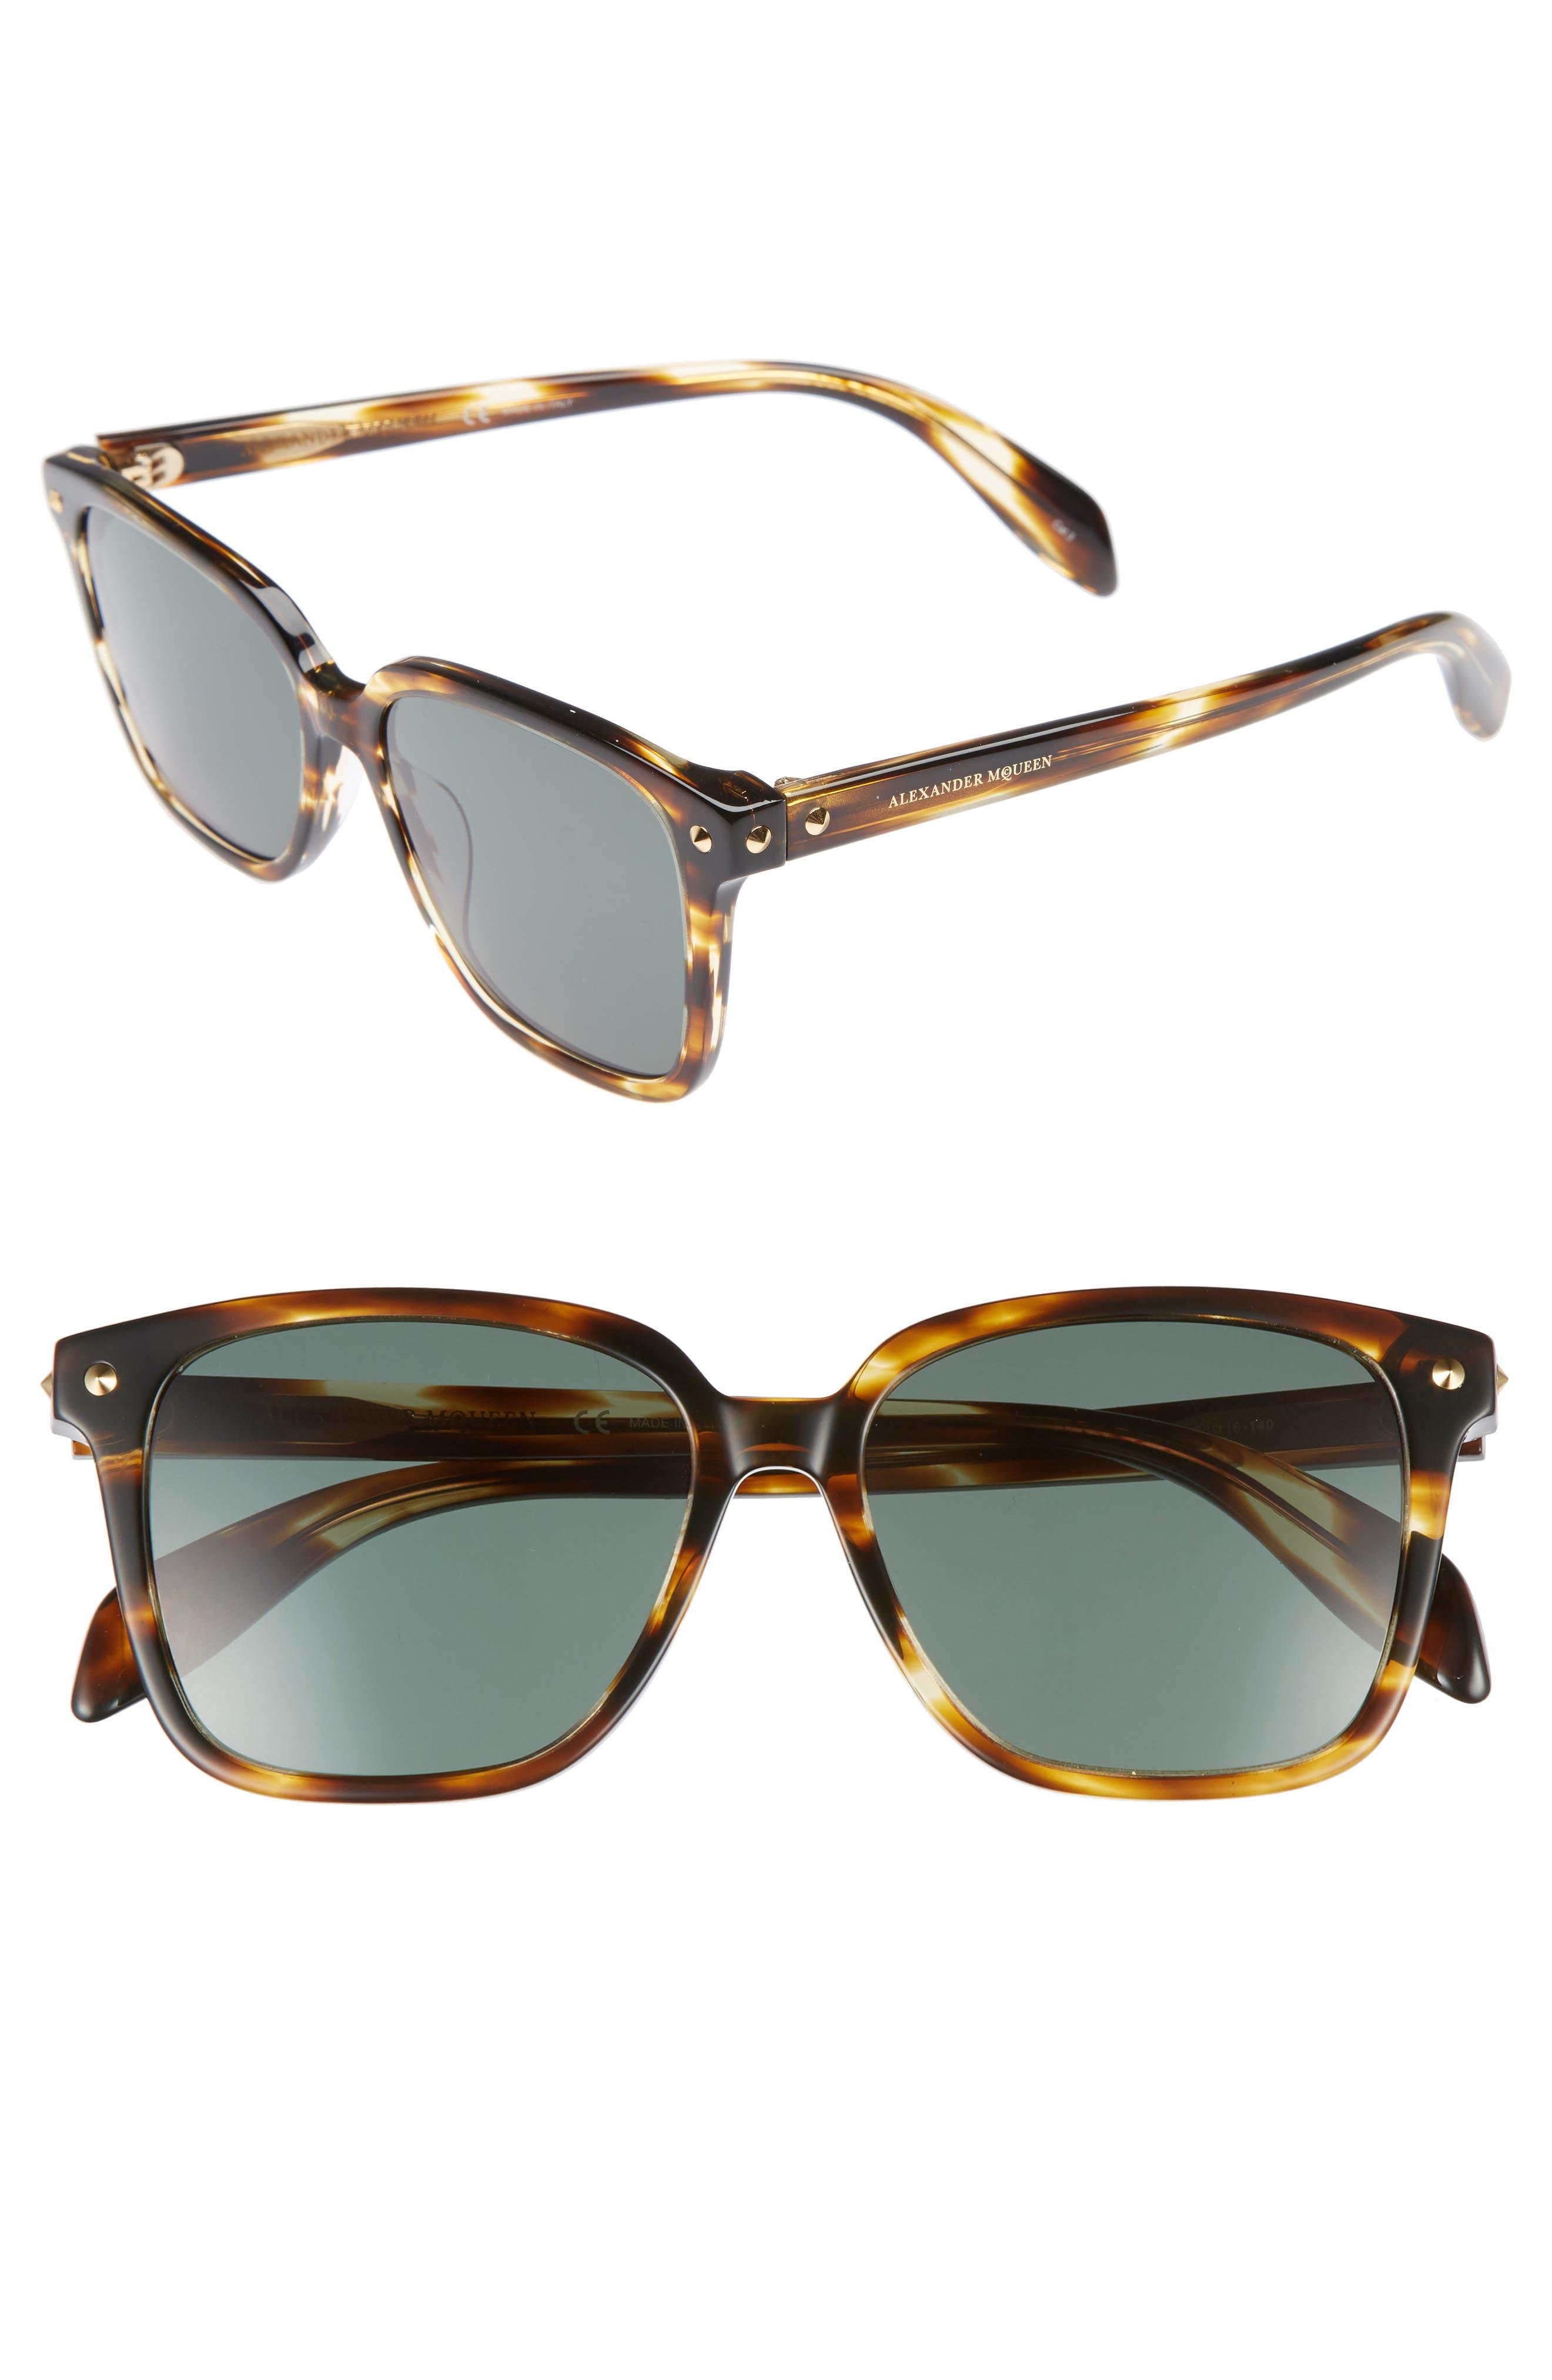 Main Image - Alexander McQueen 53mm Square Sunglasses